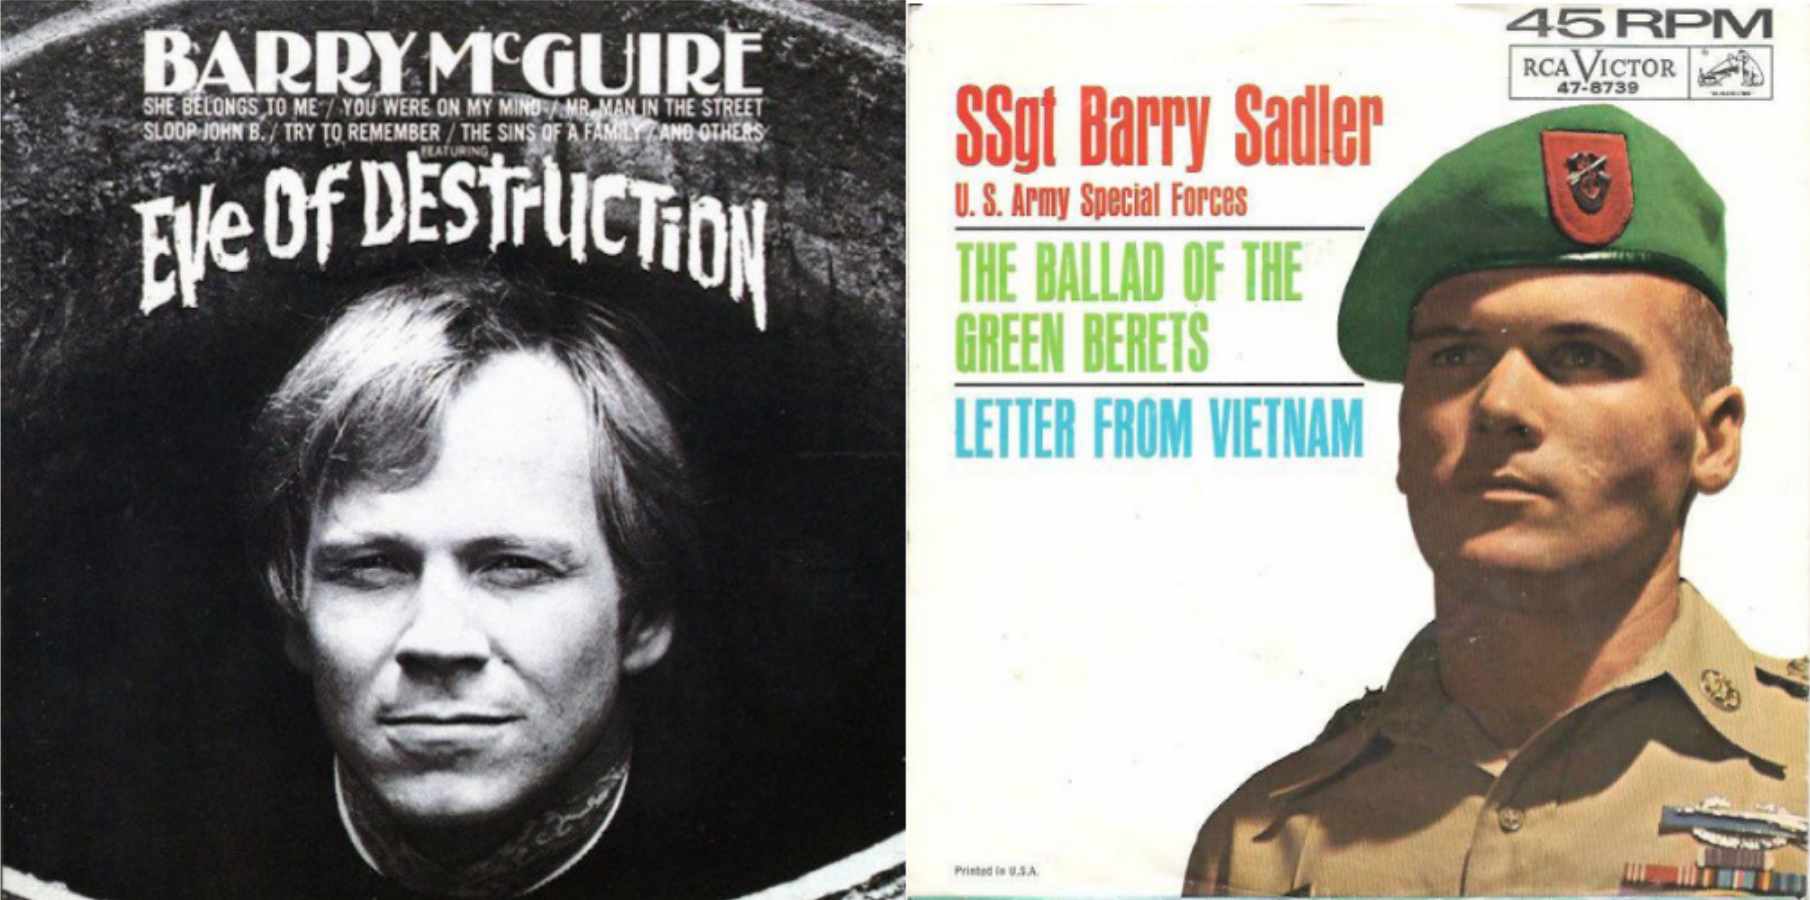 Barry McGuire vs  Barry Sadler: When the News Hit #1 | Best